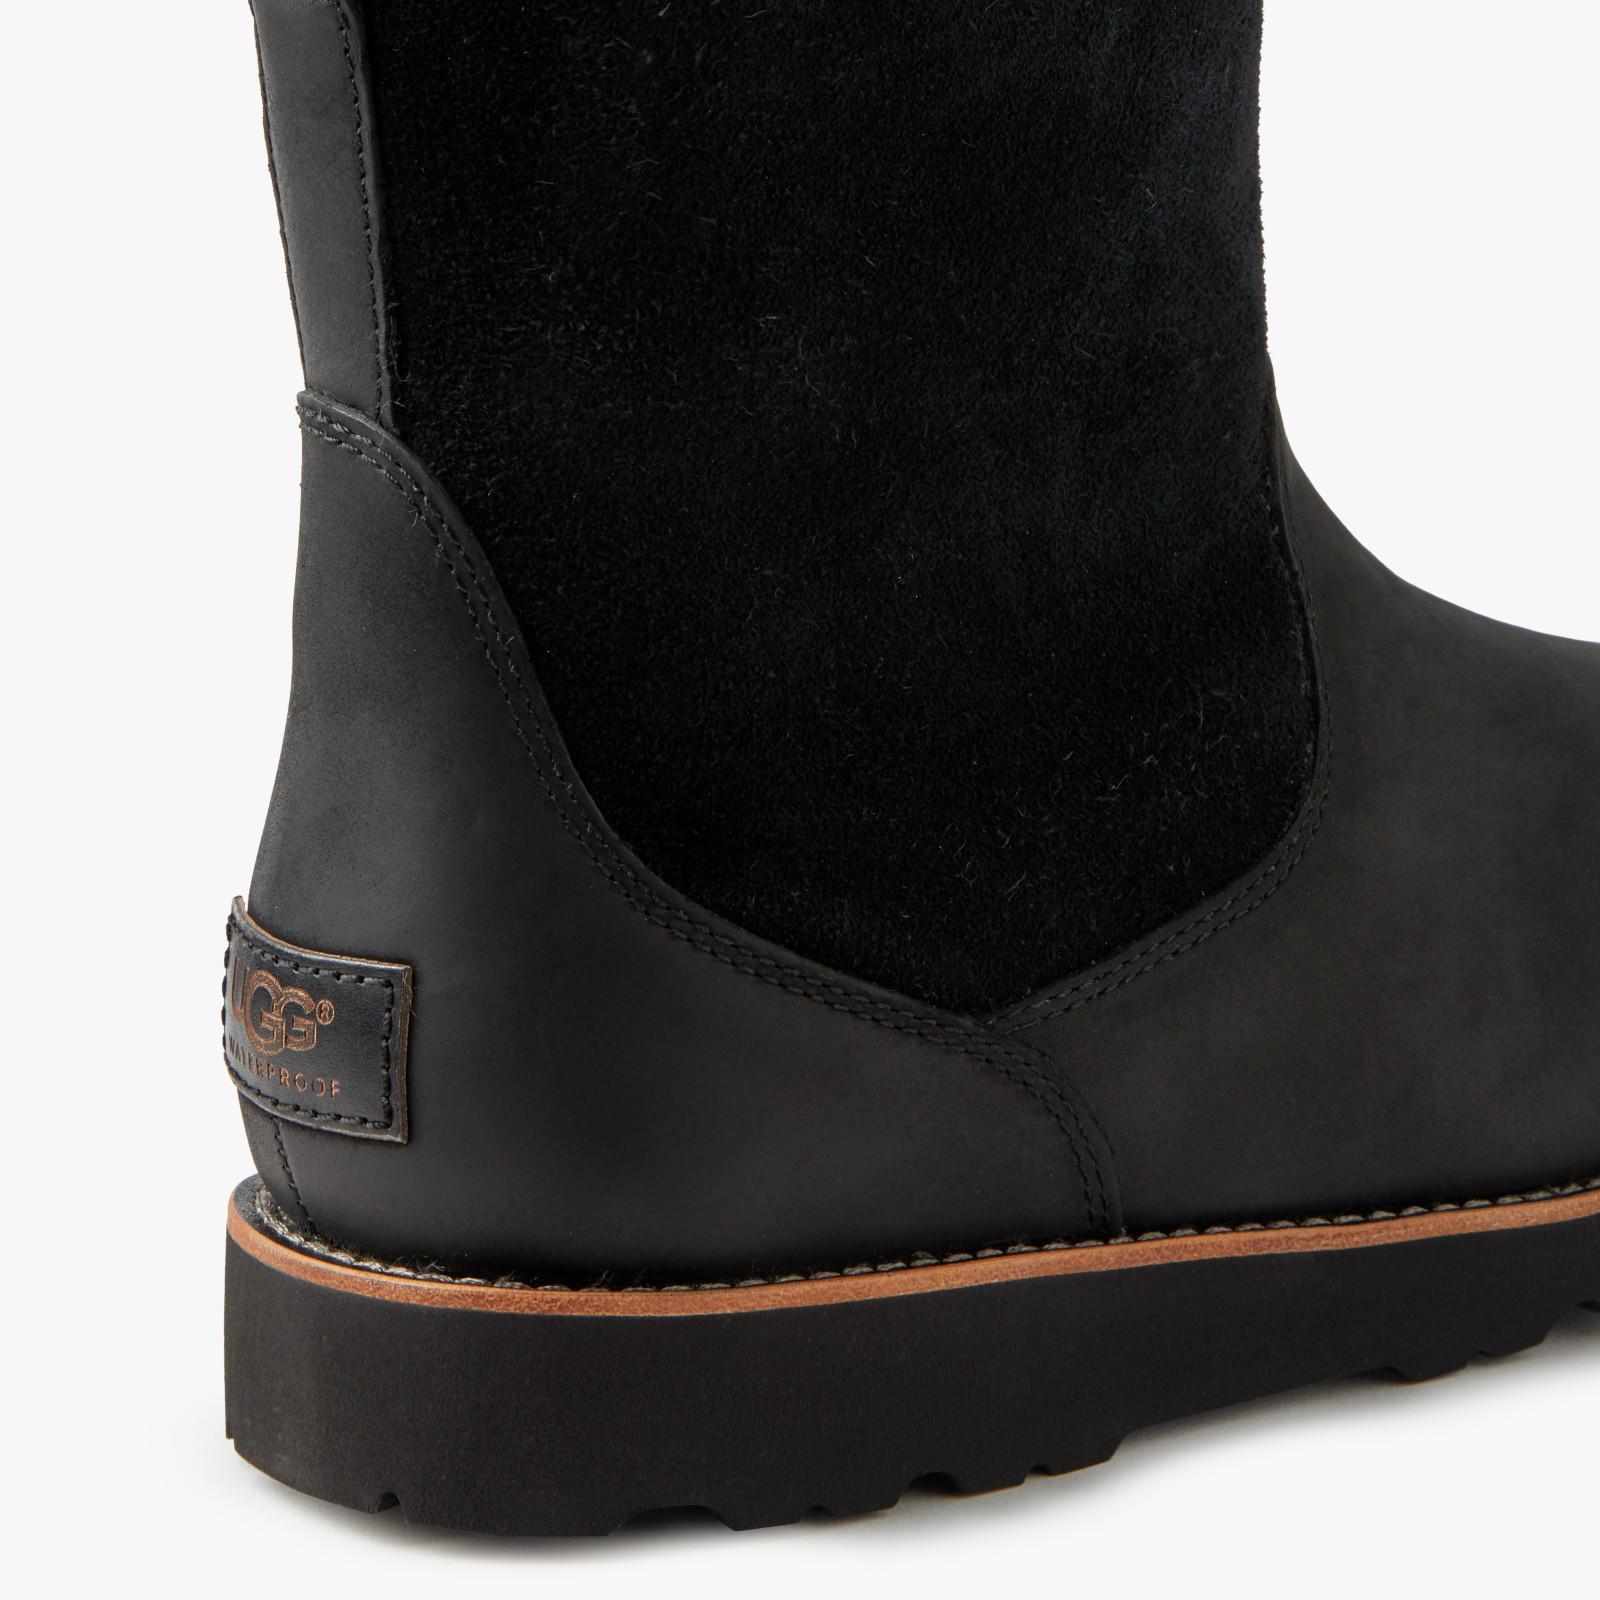 UGG Leather Hendren Waterproof Boots in Black